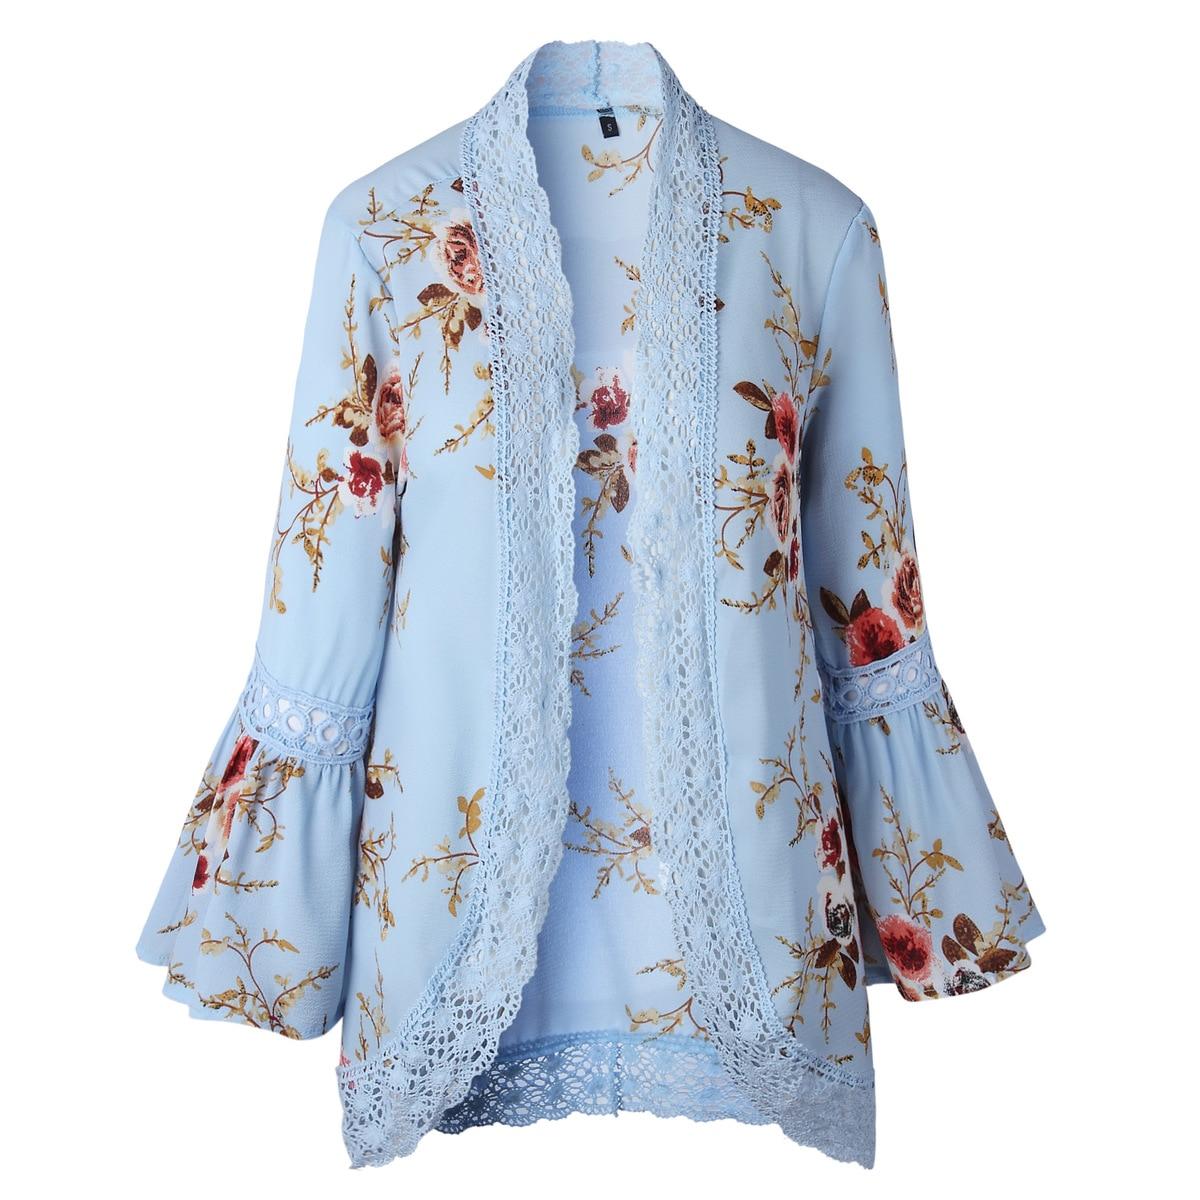 HTB1uDKivZuYBuNkSmRyq6AA3pXaA Women Plus Size Loose Casual Basic Jackets Female 2018 Autumn Long Flare Sleeve Floral Print Outwear Coat Open Stitch Clothing